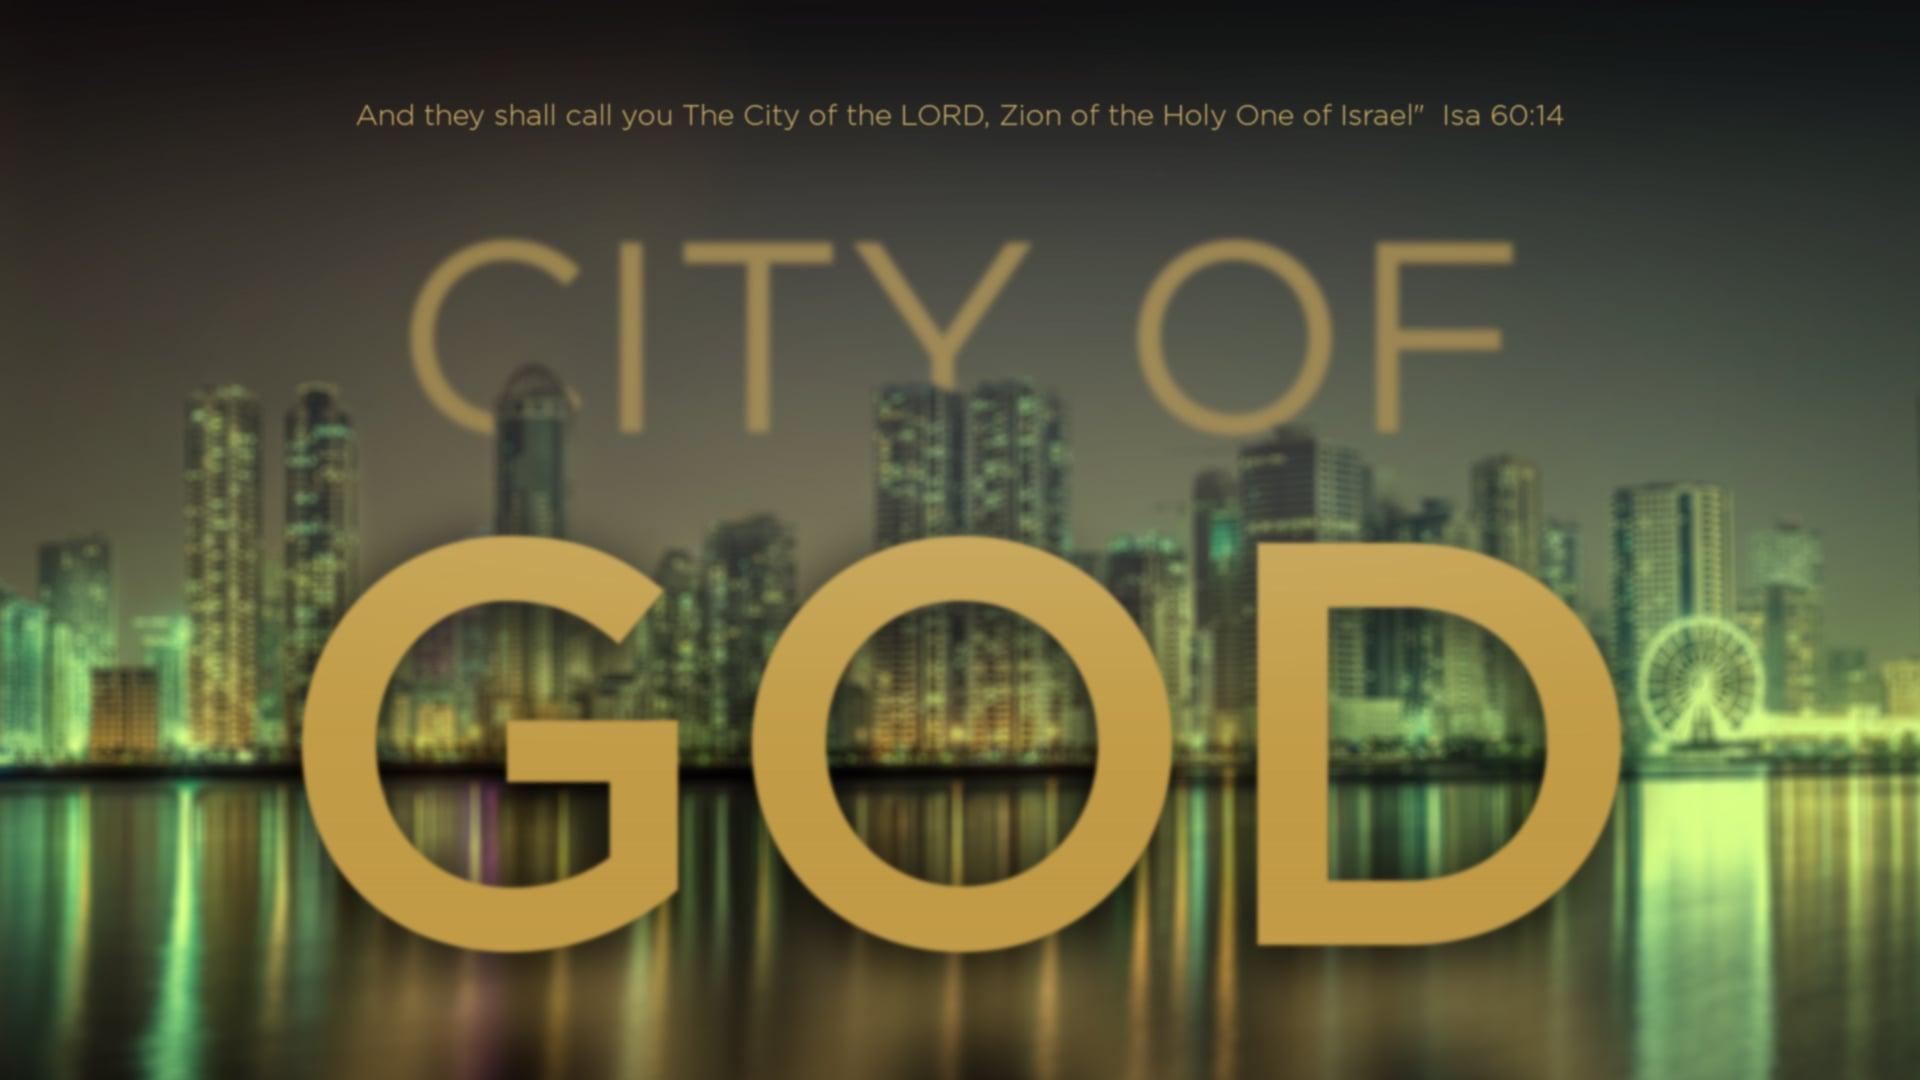 City of God - Part 5